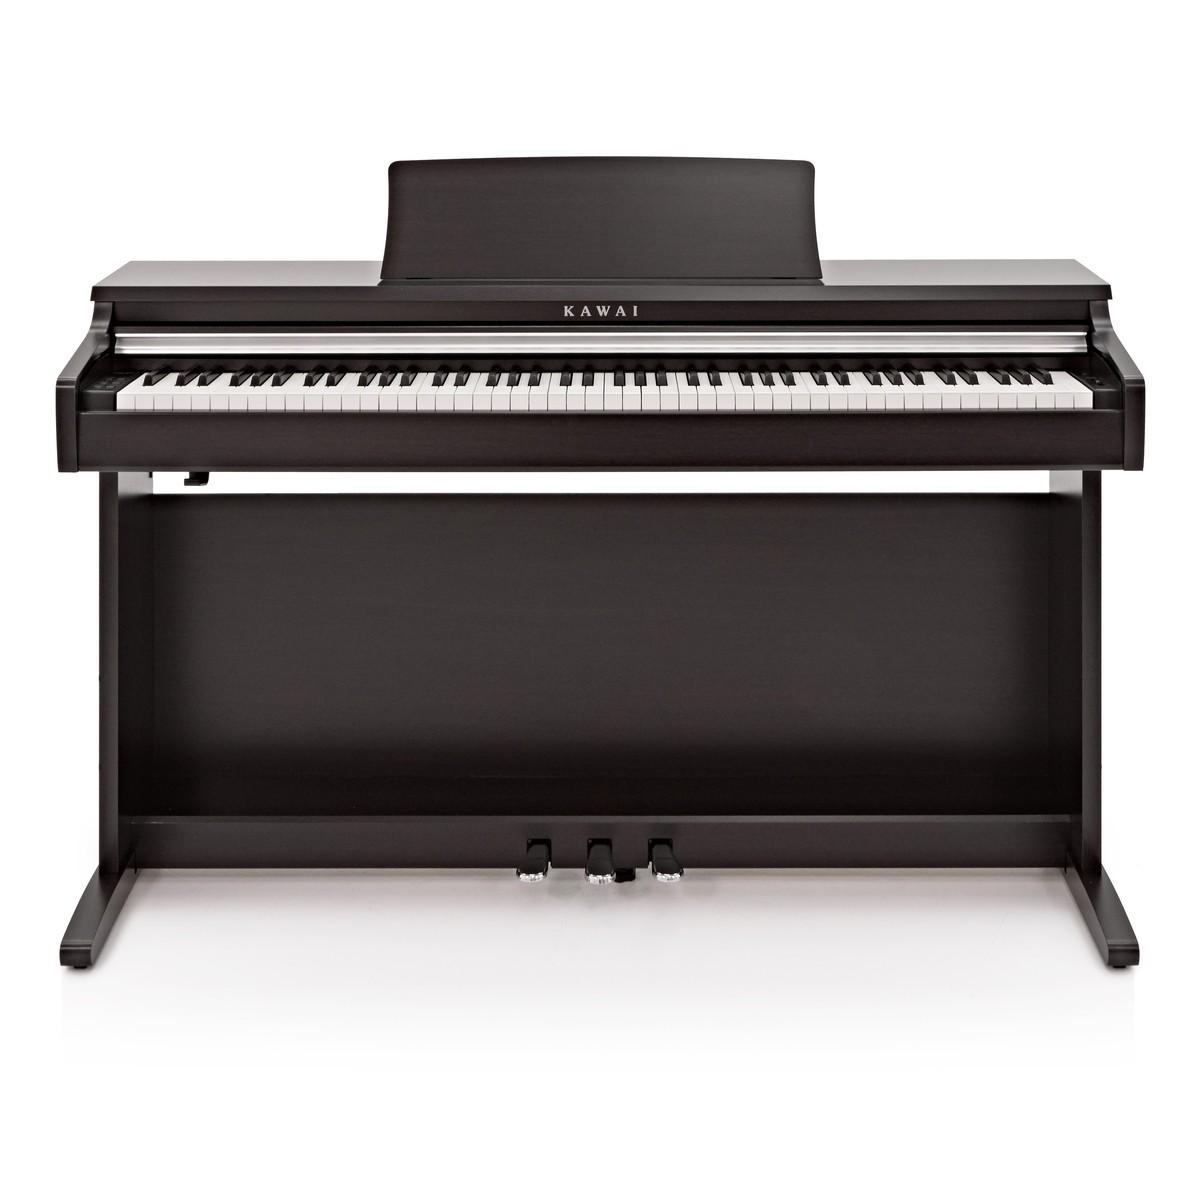 kawai kdp110 digital piano premium rosewood at gear4music. Black Bedroom Furniture Sets. Home Design Ideas